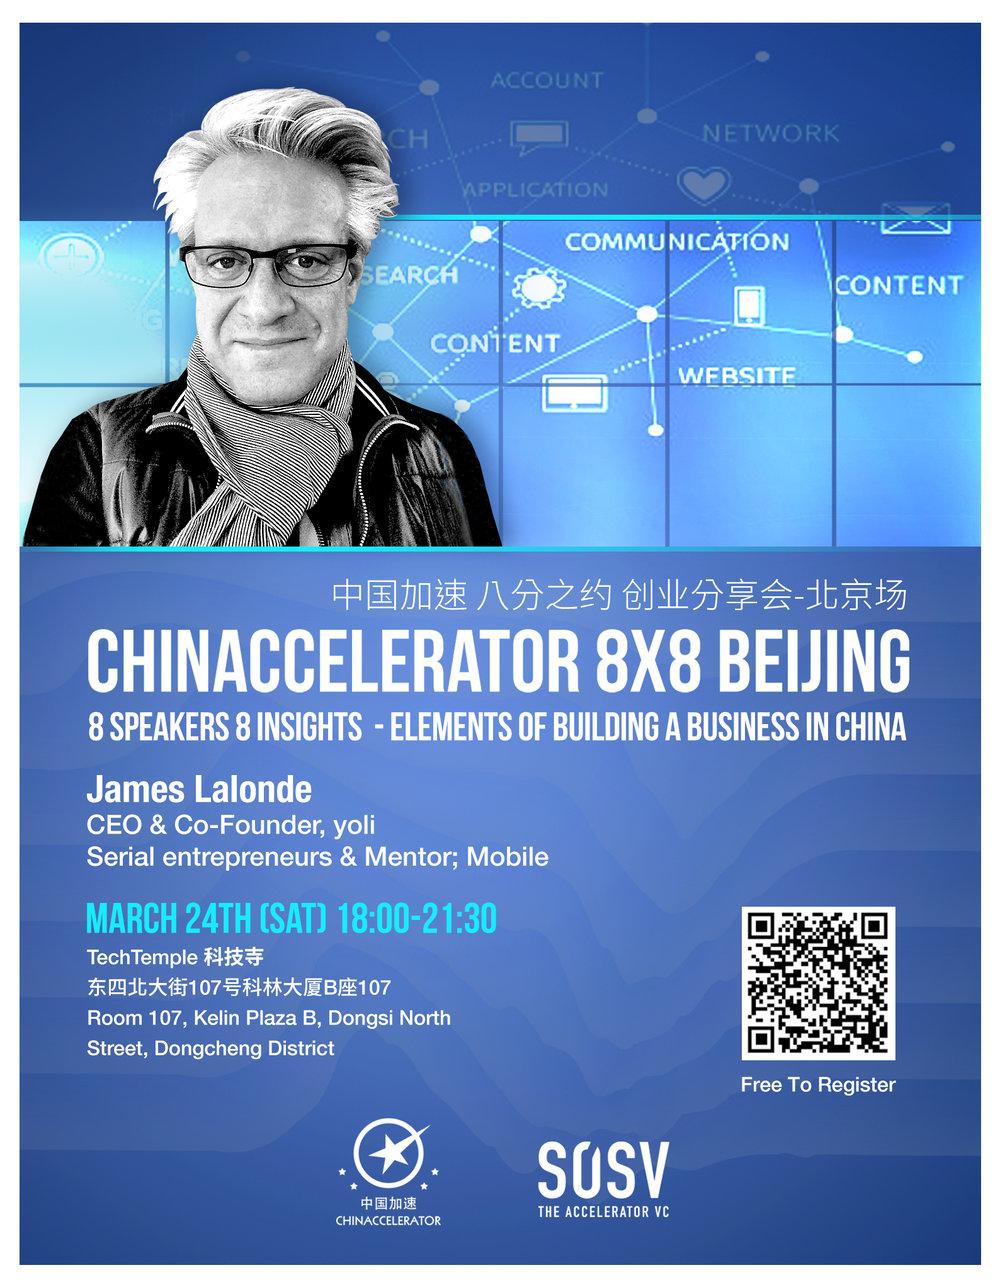 ChinaAccelerator8x8Promo.jpg